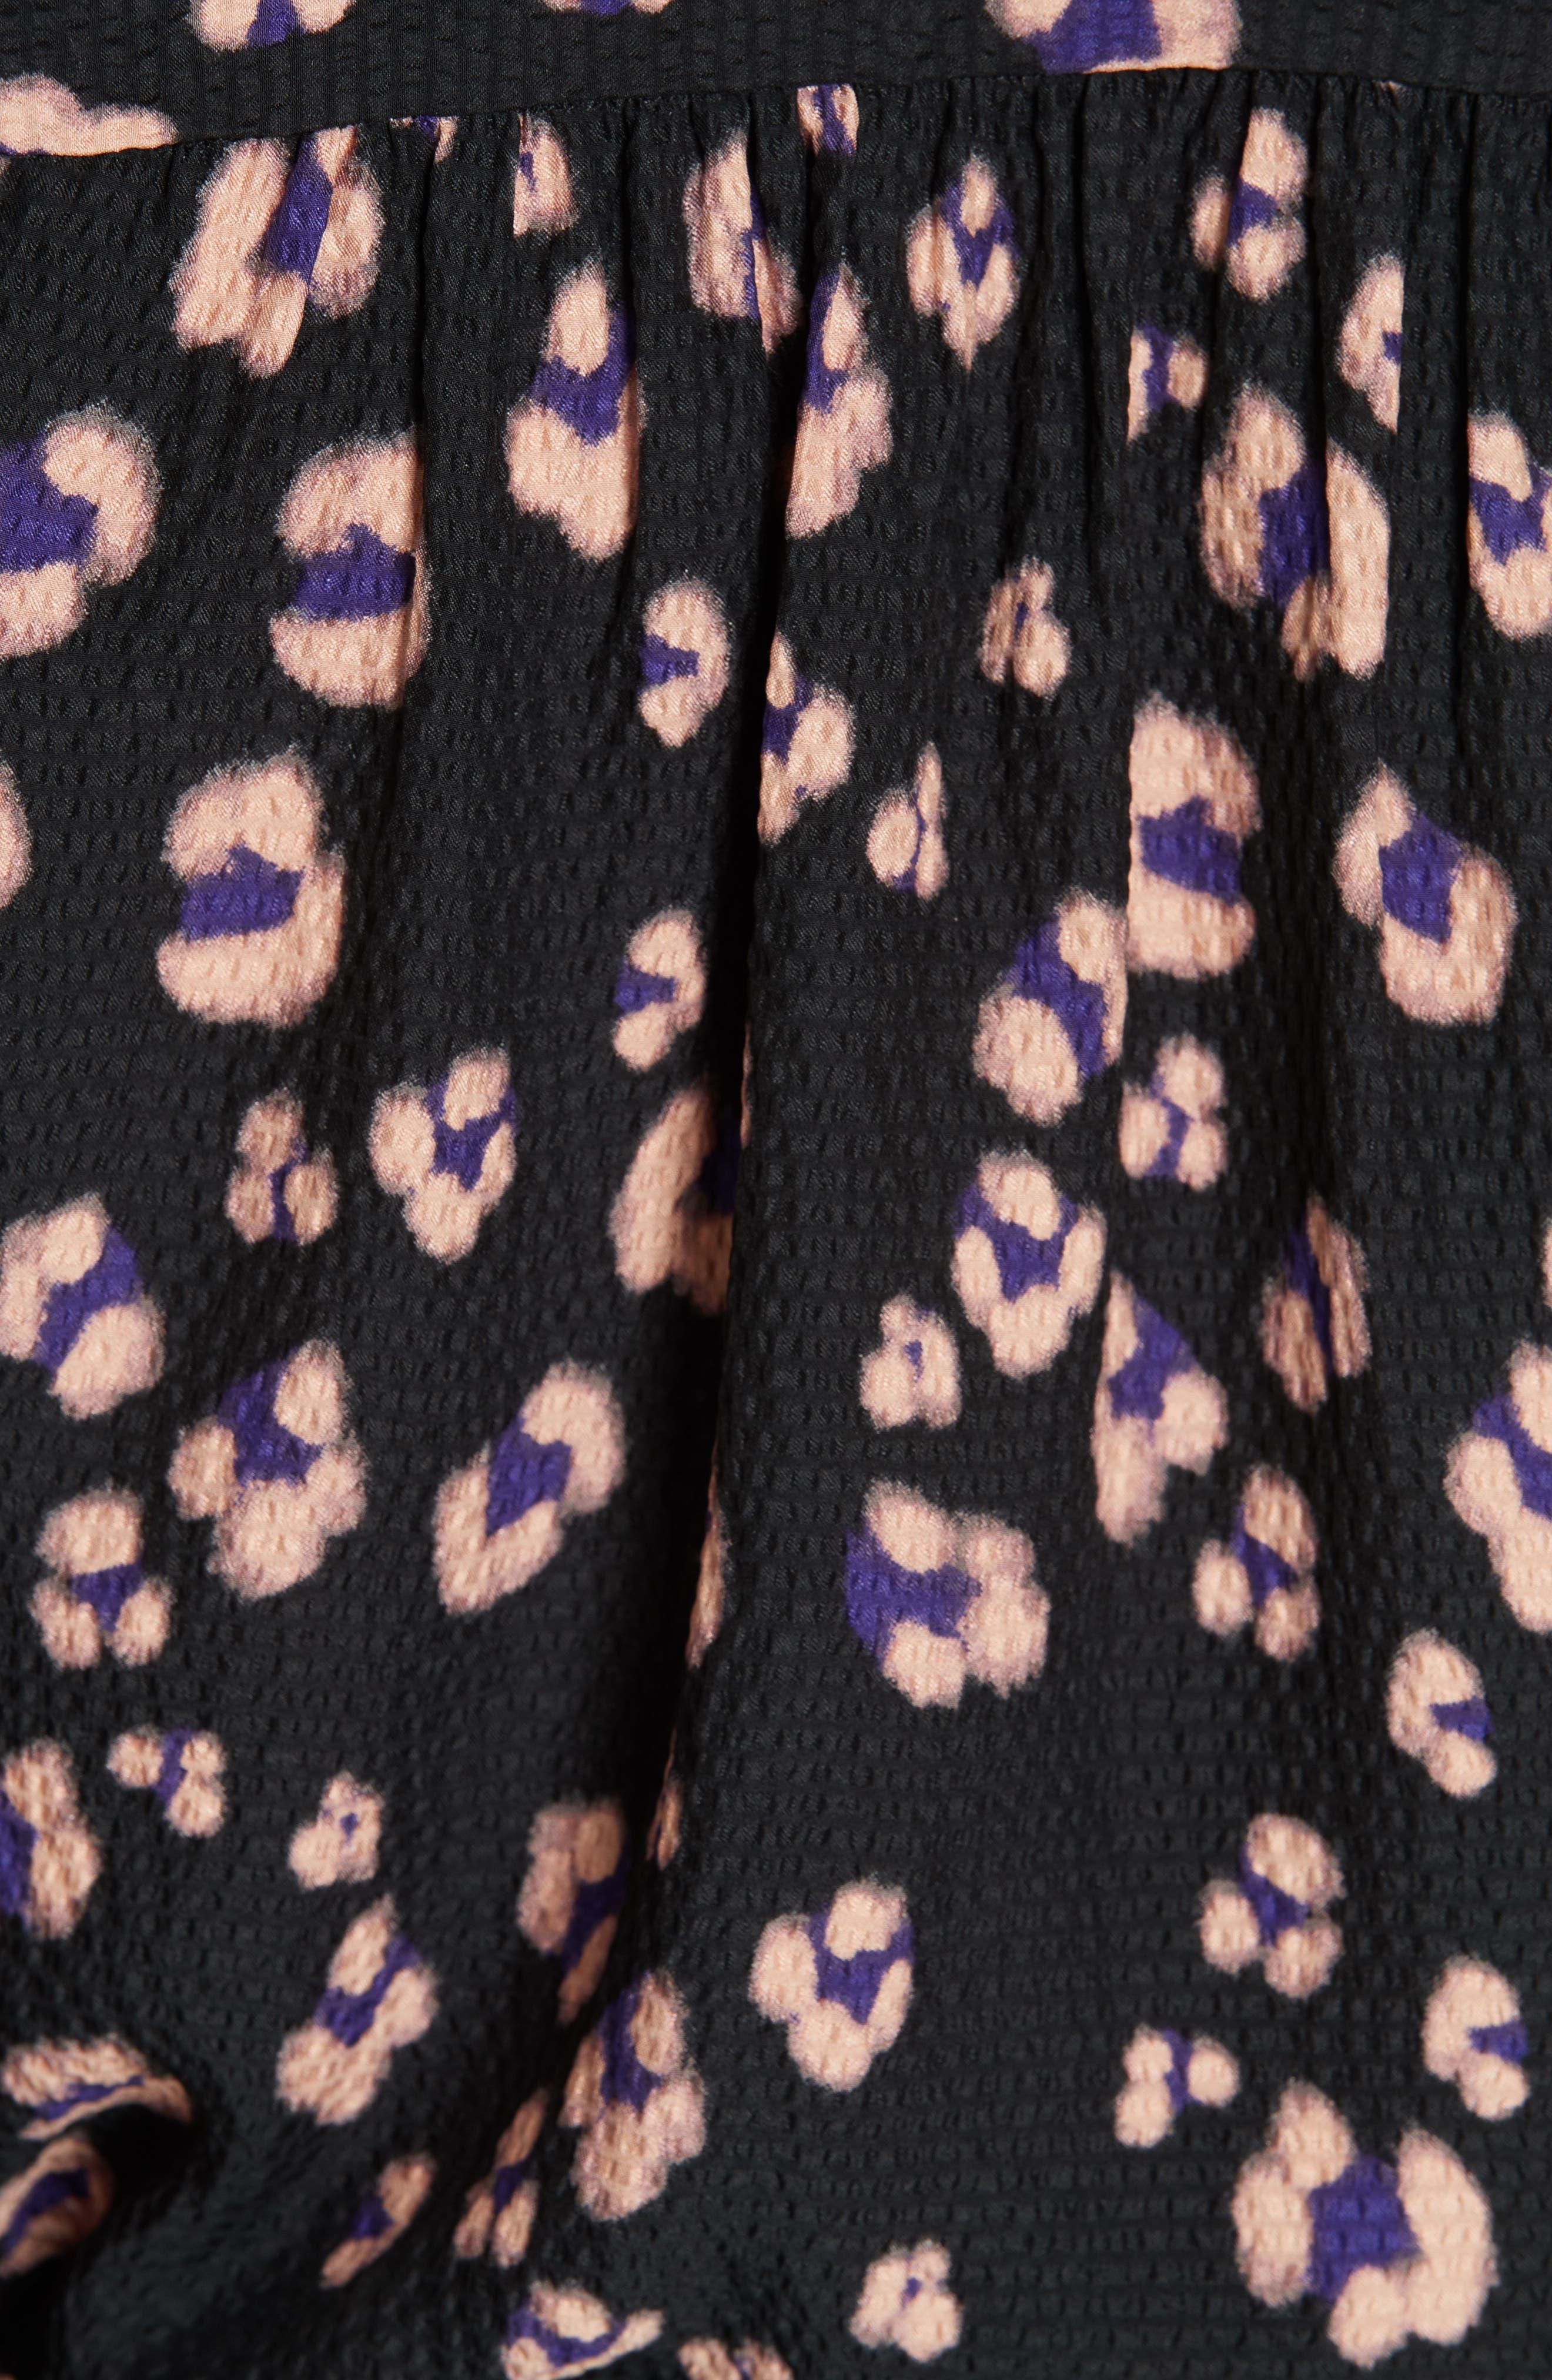 Cheetah Print Silk Top,                             Alternate thumbnail 5, color,                             COPPER COMBO